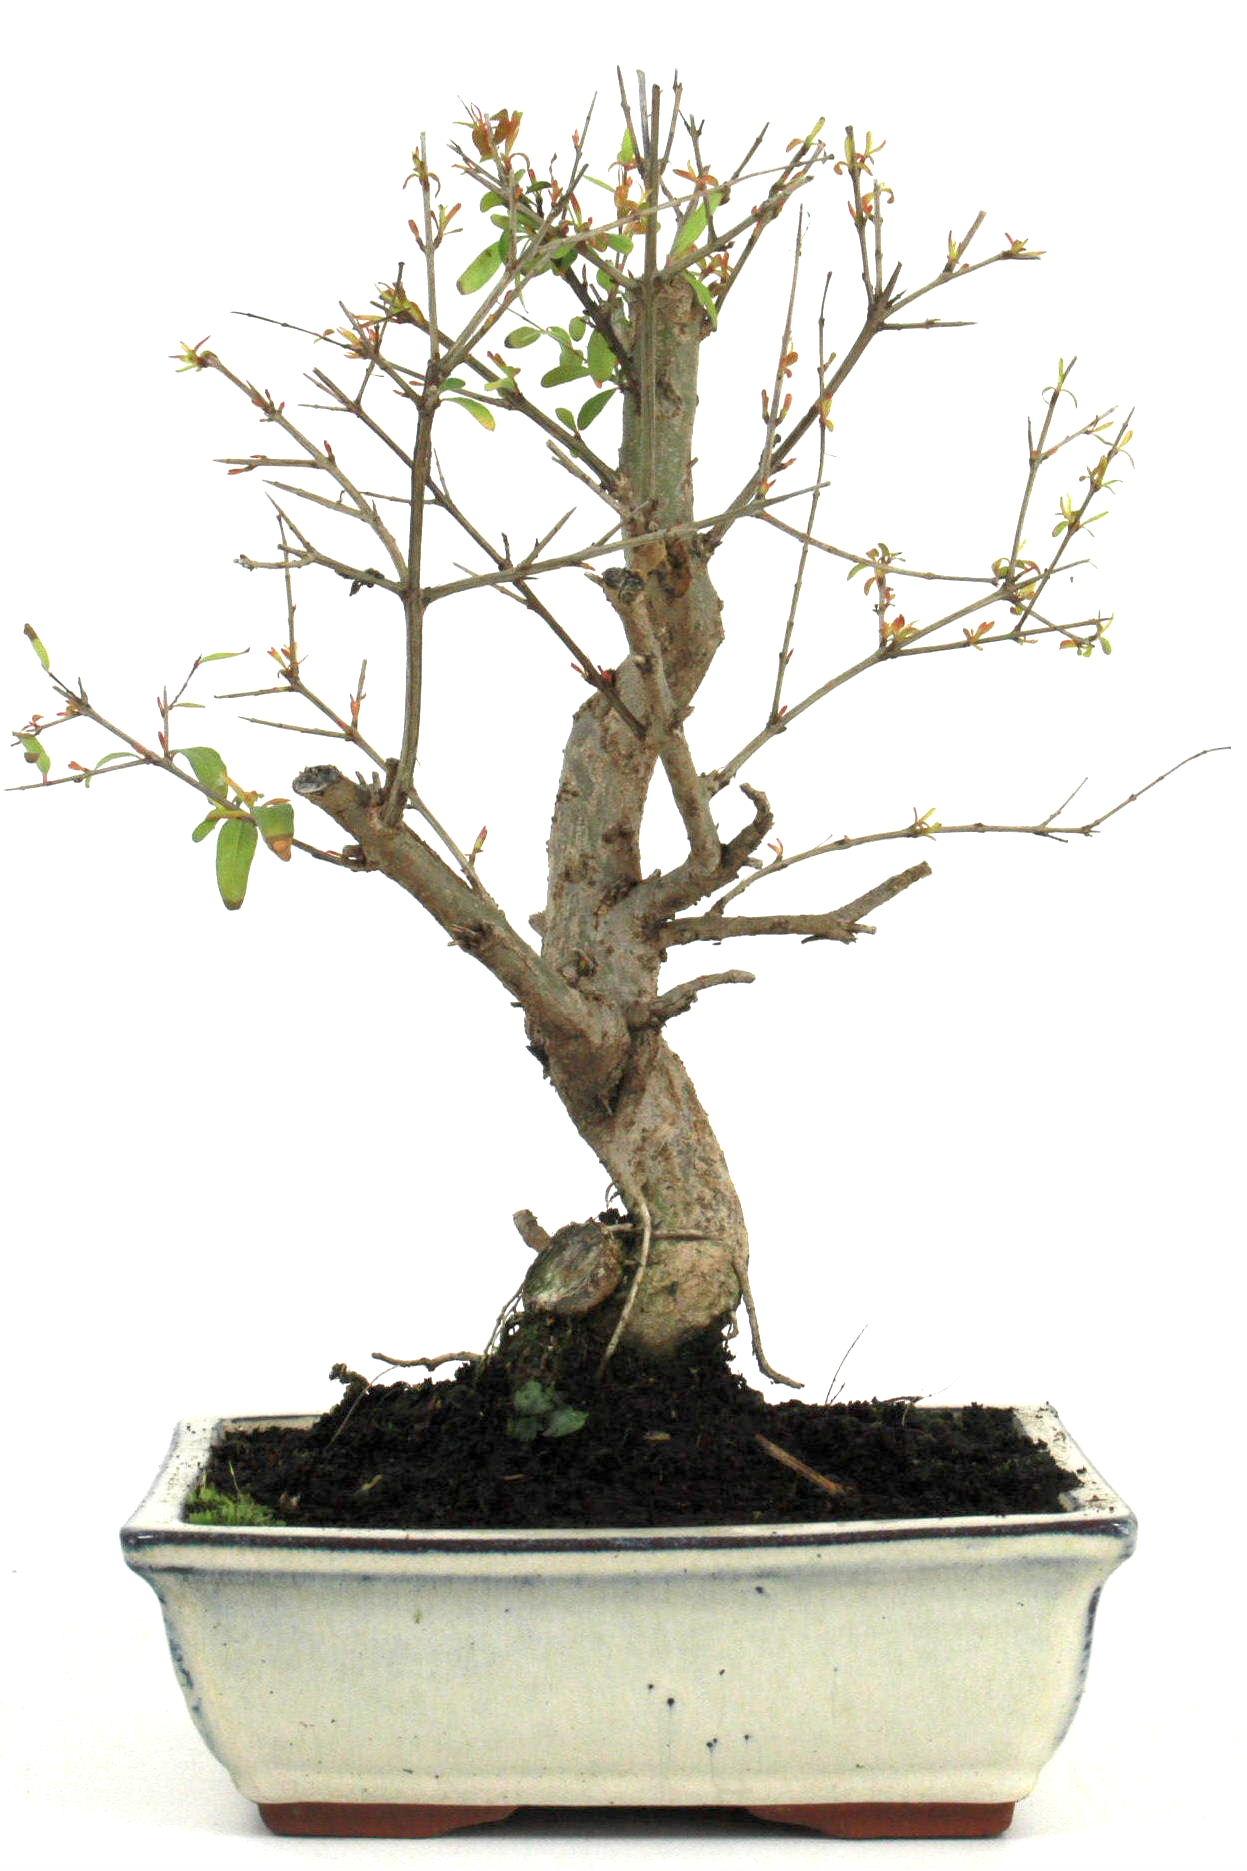 bonsai granatapfel 35 40 cm 1913 bei oyaki bonsai kaufen. Black Bedroom Furniture Sets. Home Design Ideas